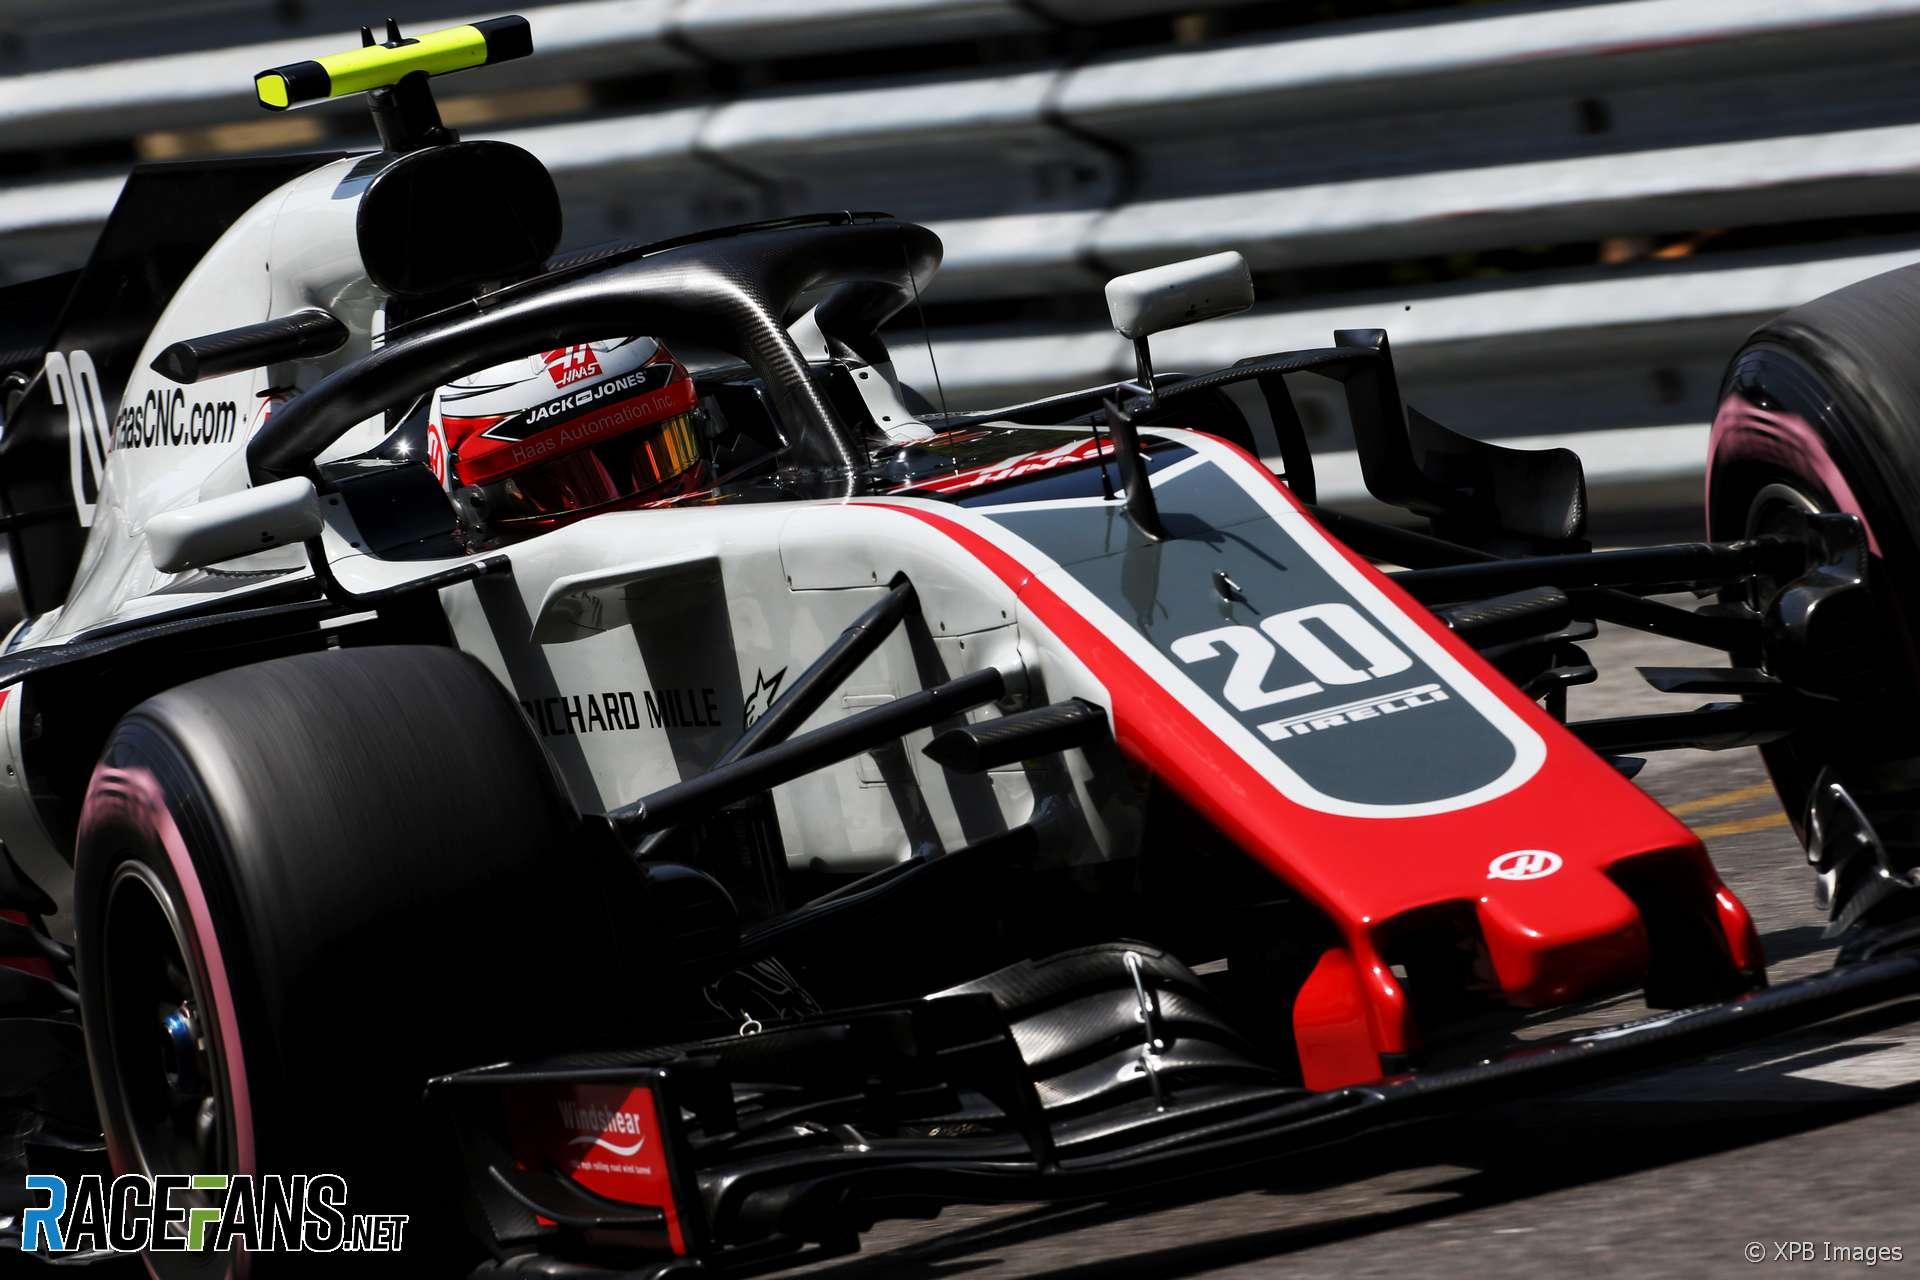 Kevin Magnussen, Haas, Monaco, 2018